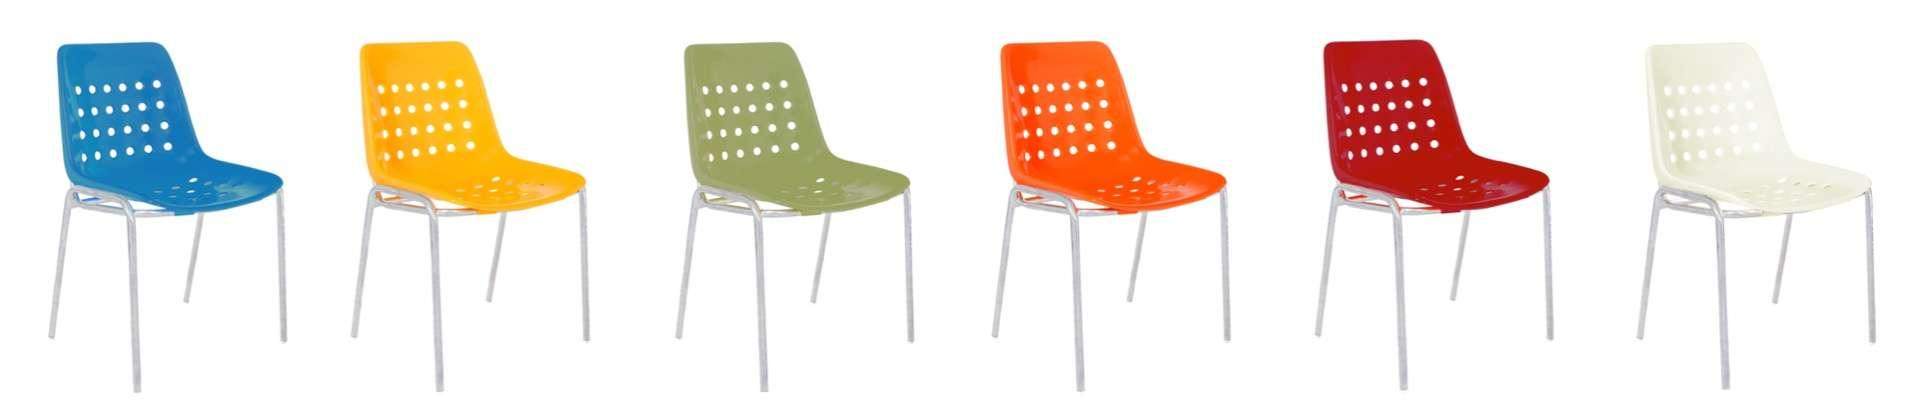 Terrassen Stühle Stapelbar